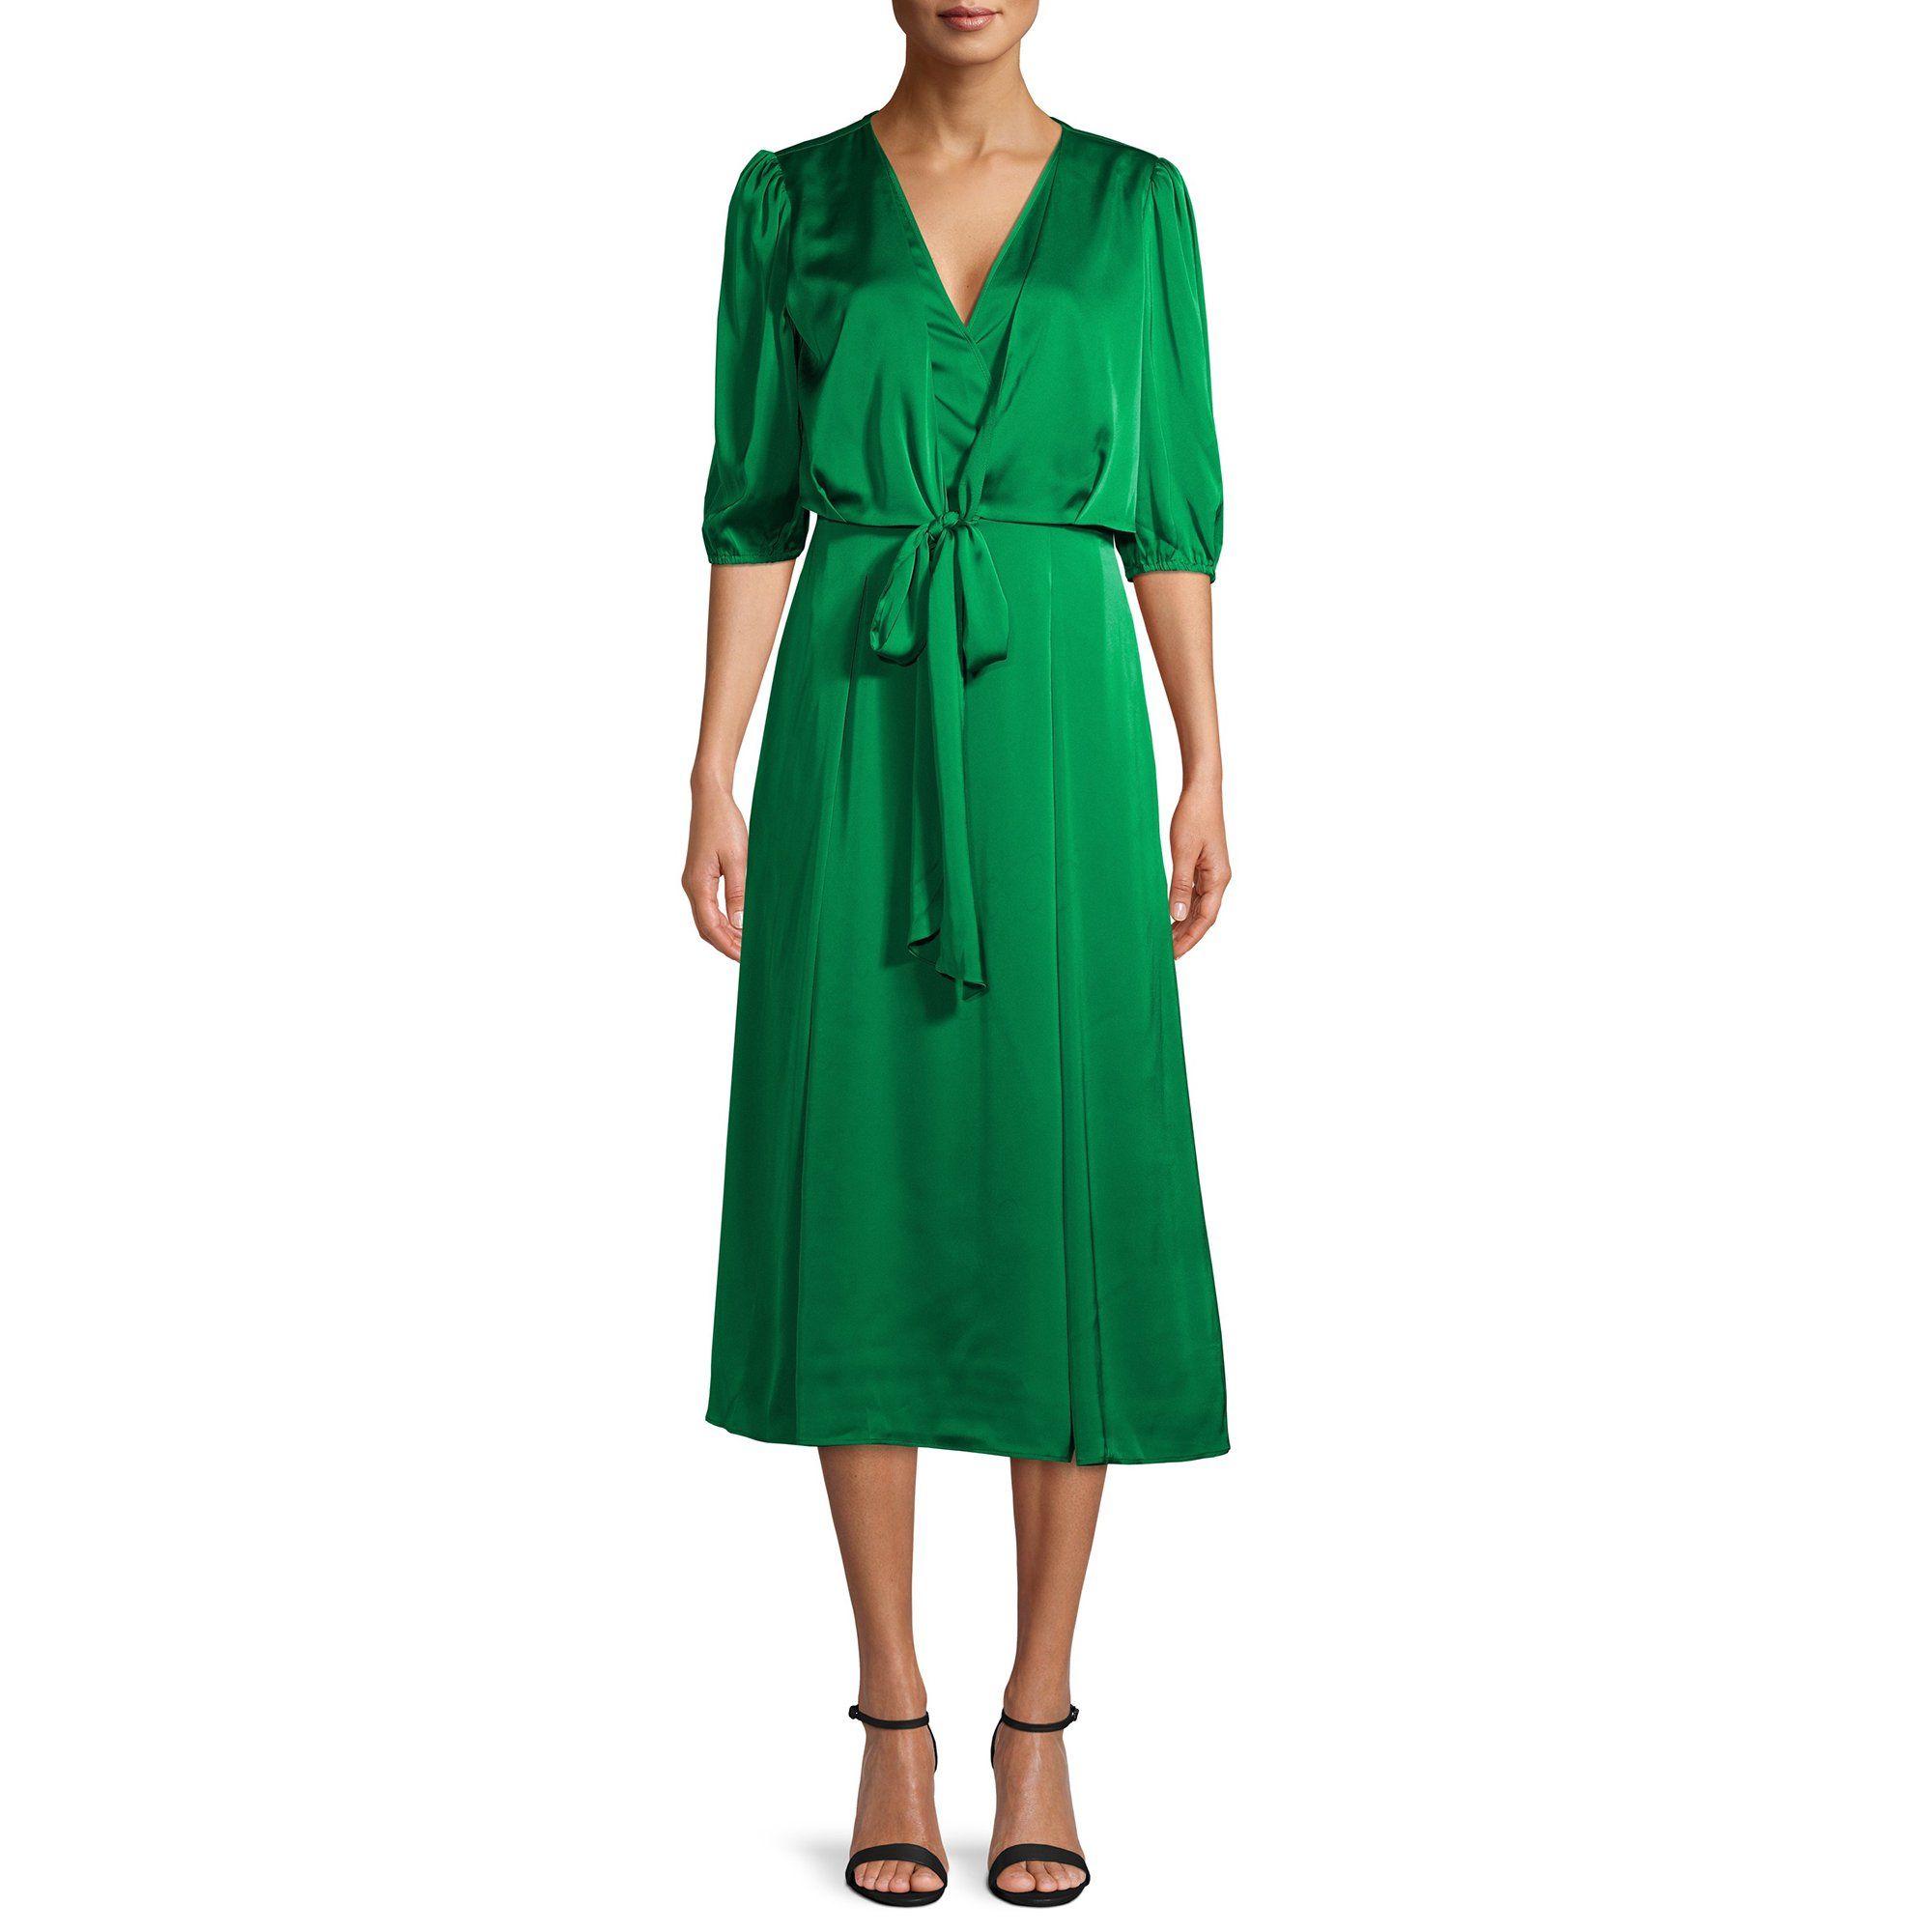 Prospect The Label Prospect The Label Women S Tie Front Dress Walmart Com Tie Front Dress Womens Tie Dresses [ 2000 x 2000 Pixel ]